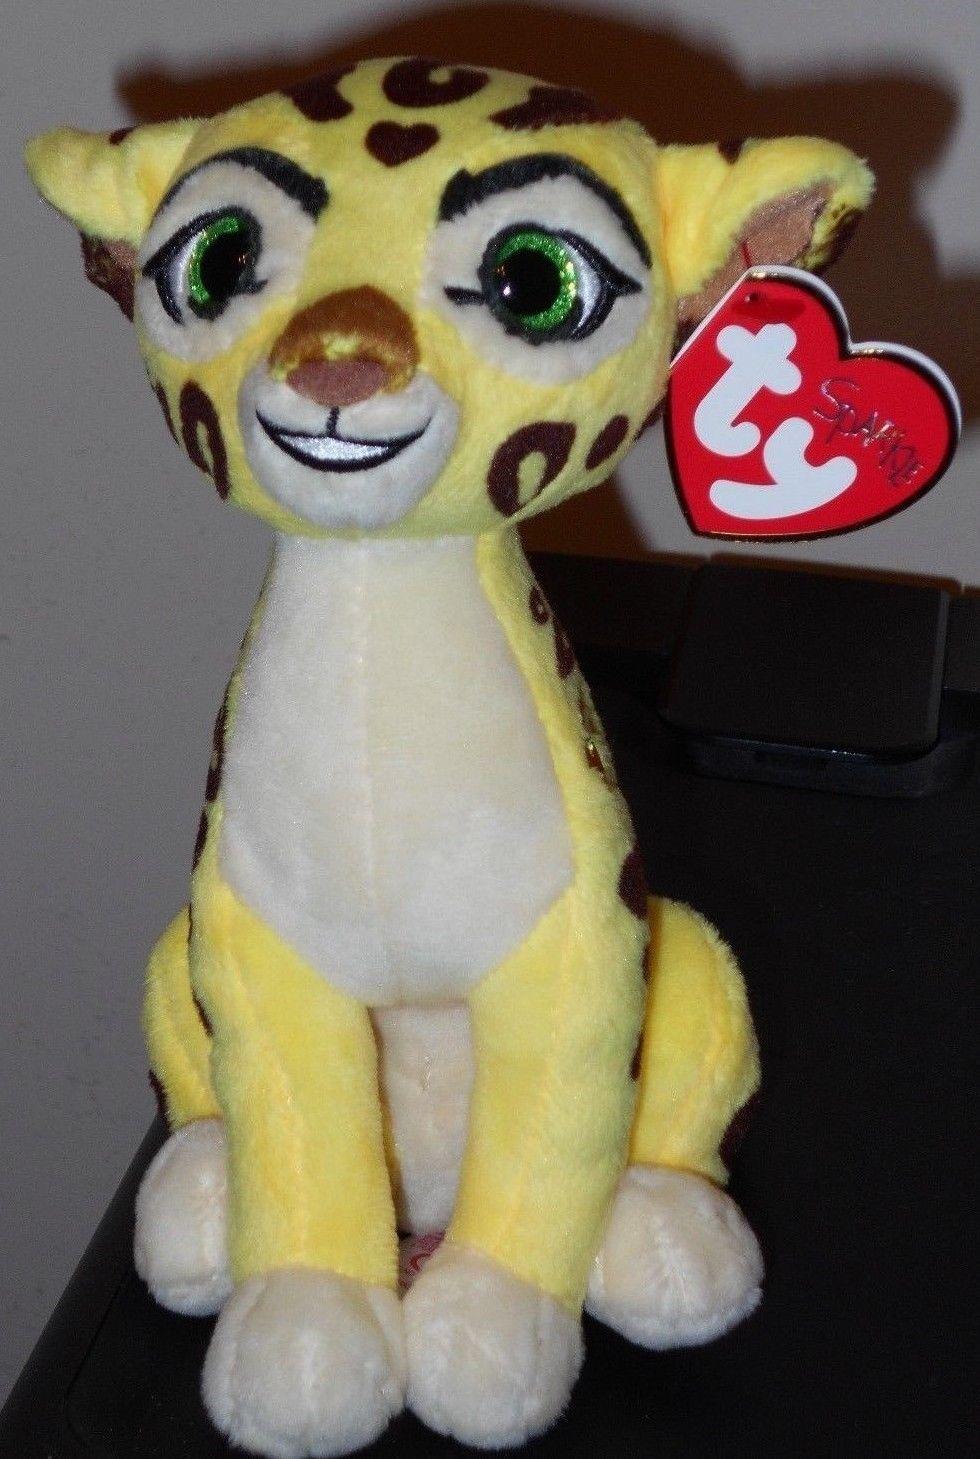 Disney The Lion Guard - MWMTs Stuffed Animal FULI the Cheetah TY Beanie Baby